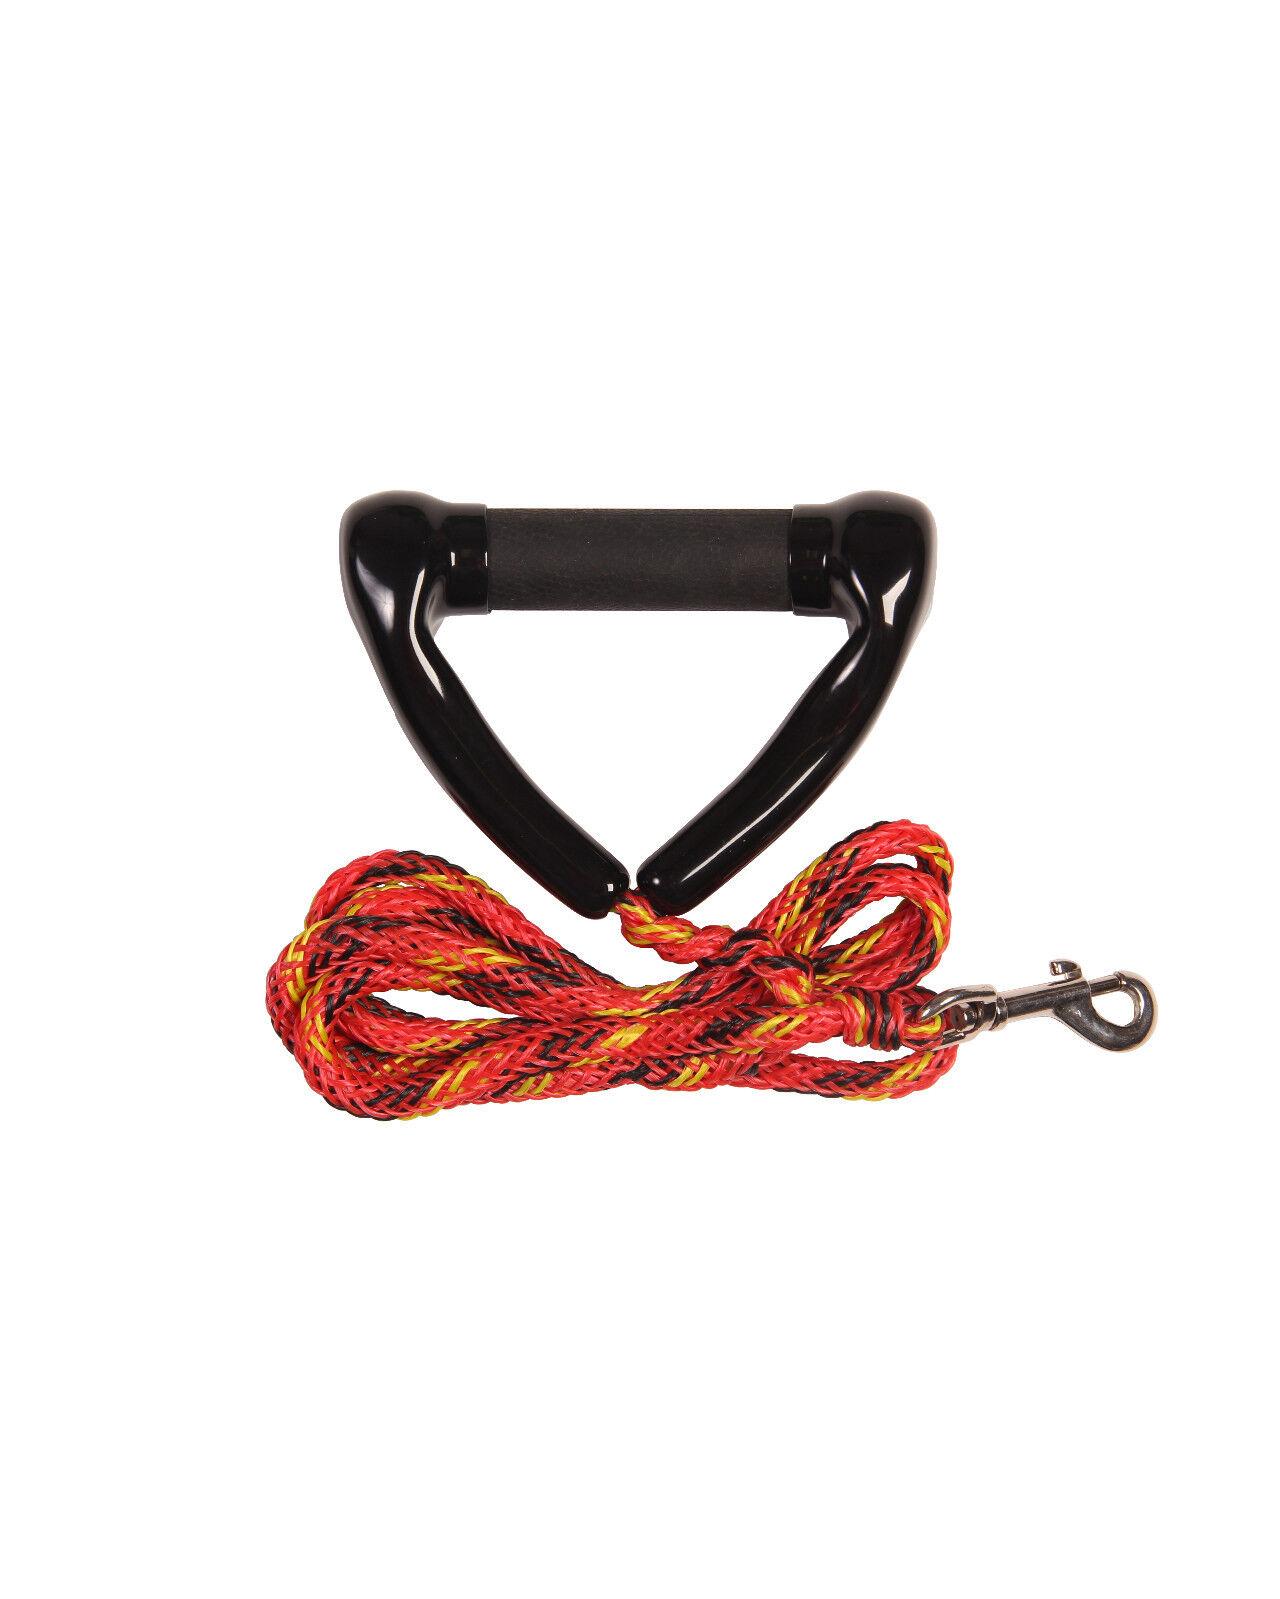 Jobe Dog Leash Dog Leash Canvas Dog 8 2 12ft Leisure wakeboardstyle Waterski J18